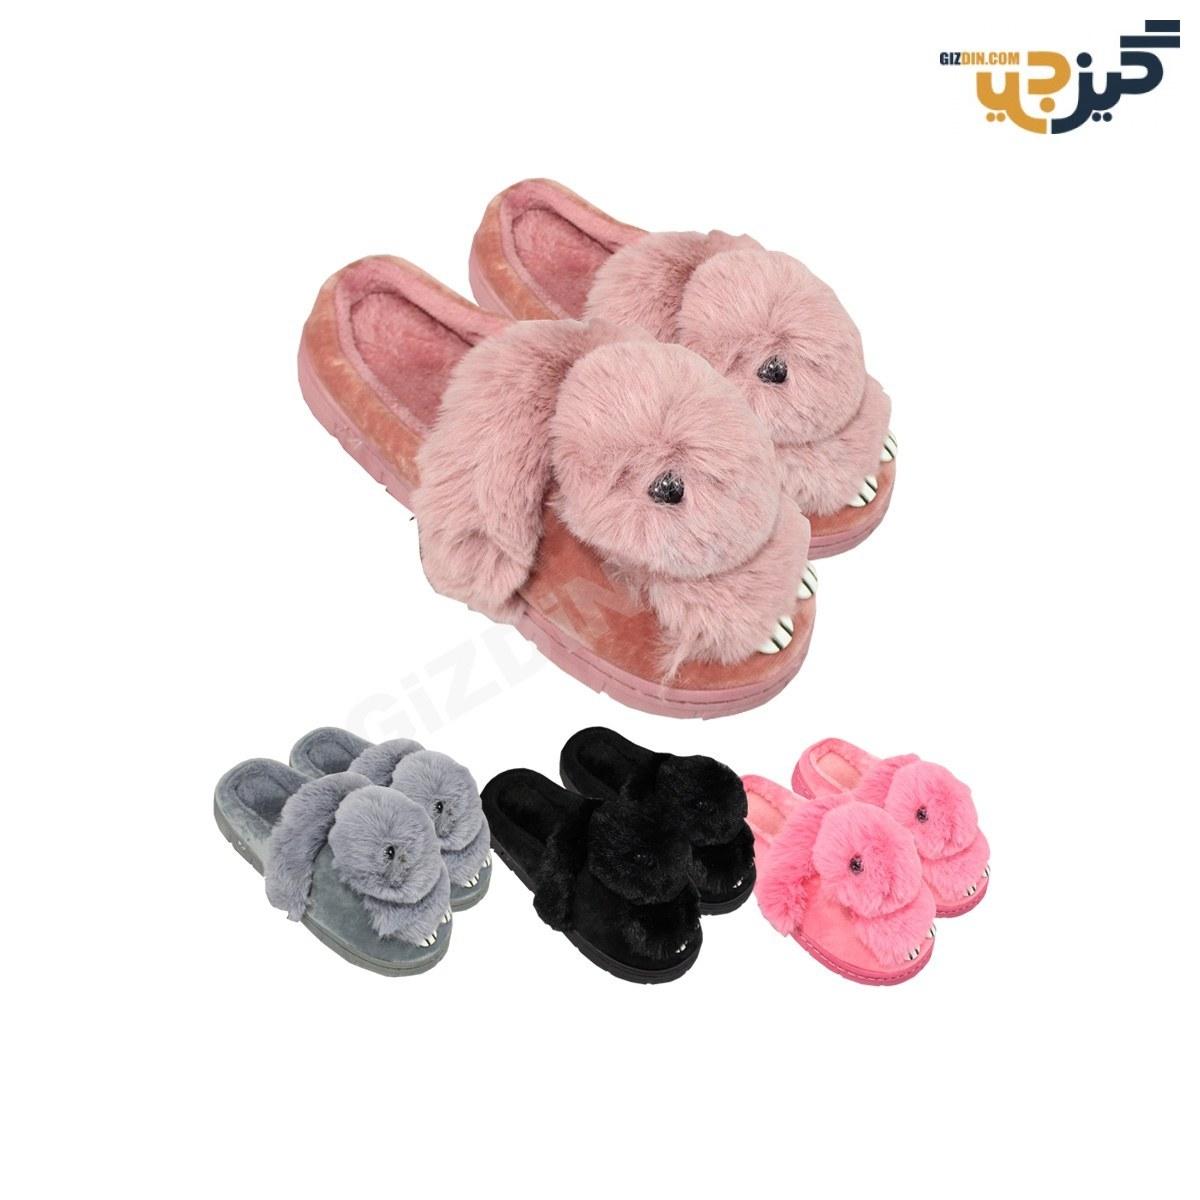 پاپوش طرح خرگوش پشمالو Family کد: p102-2